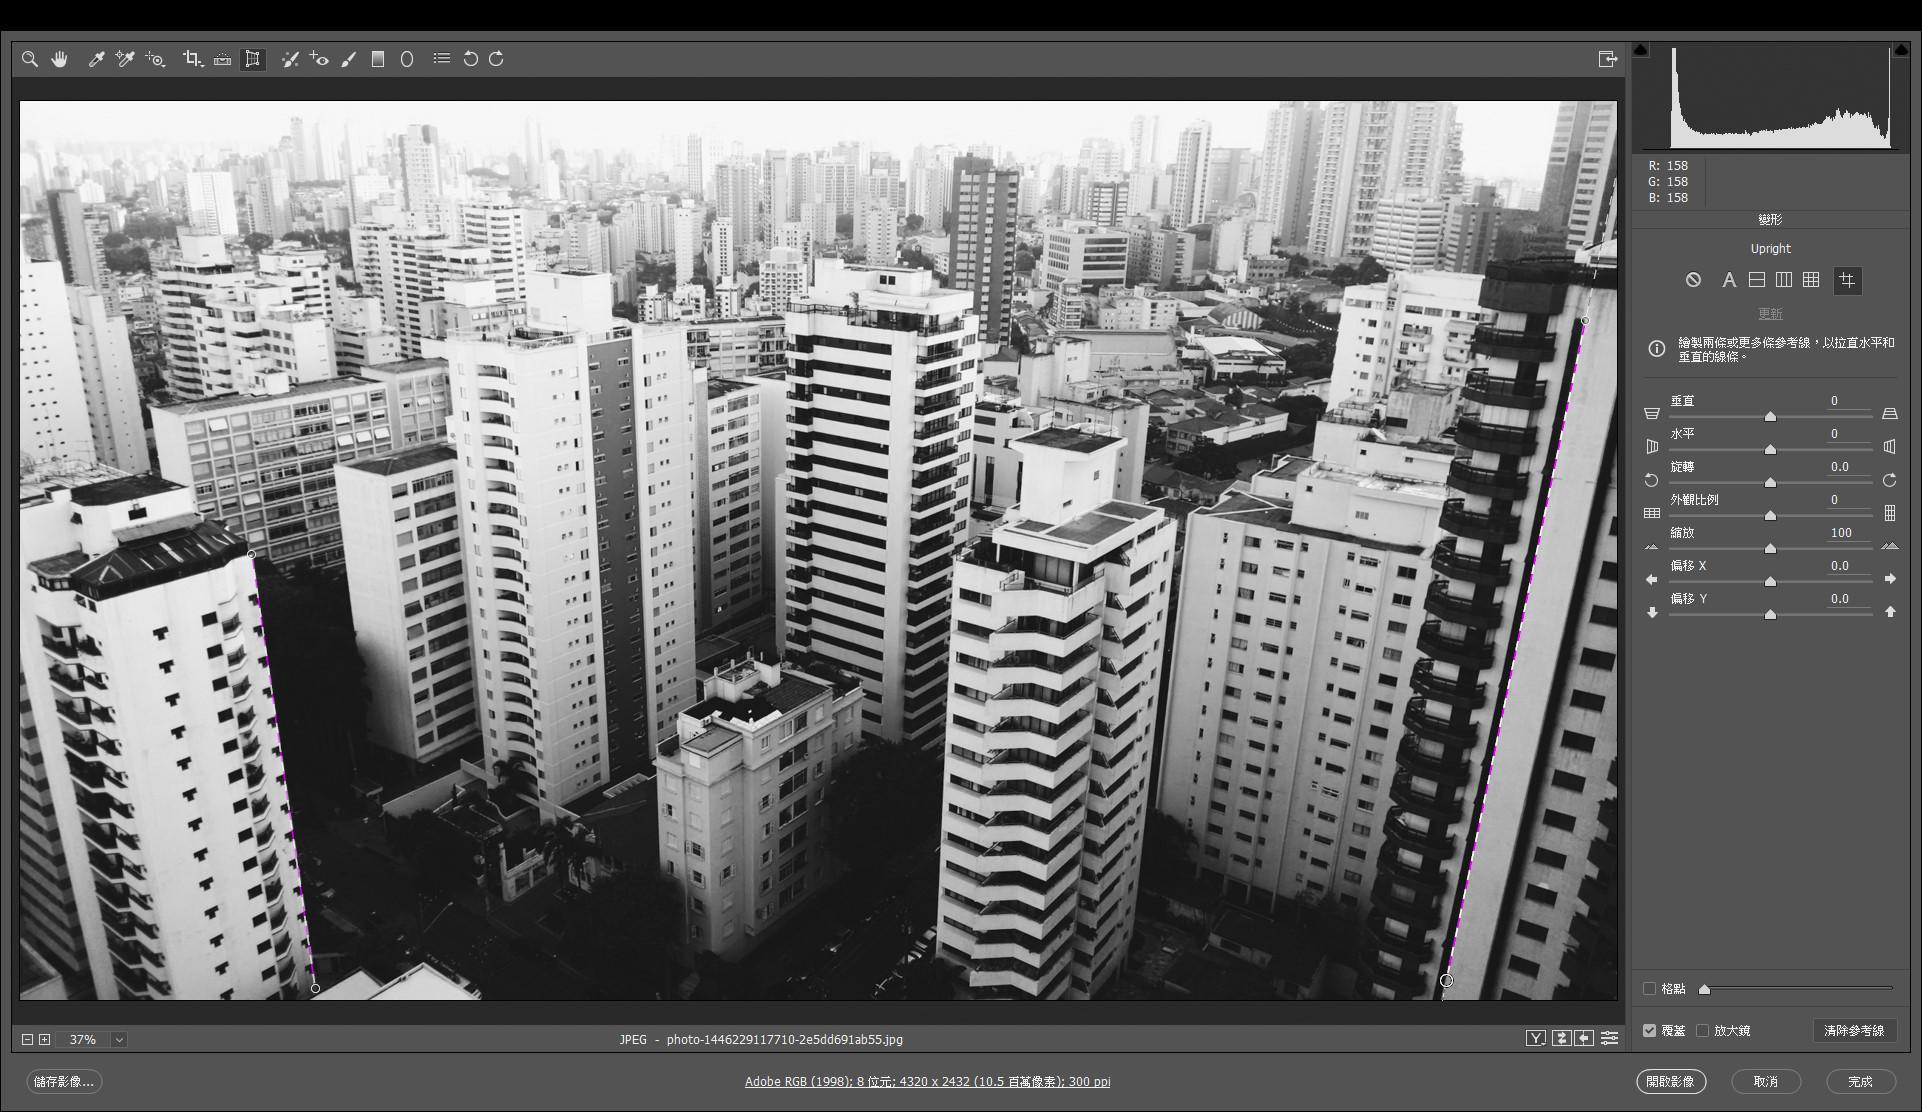 photoshop-deformation-correction 04